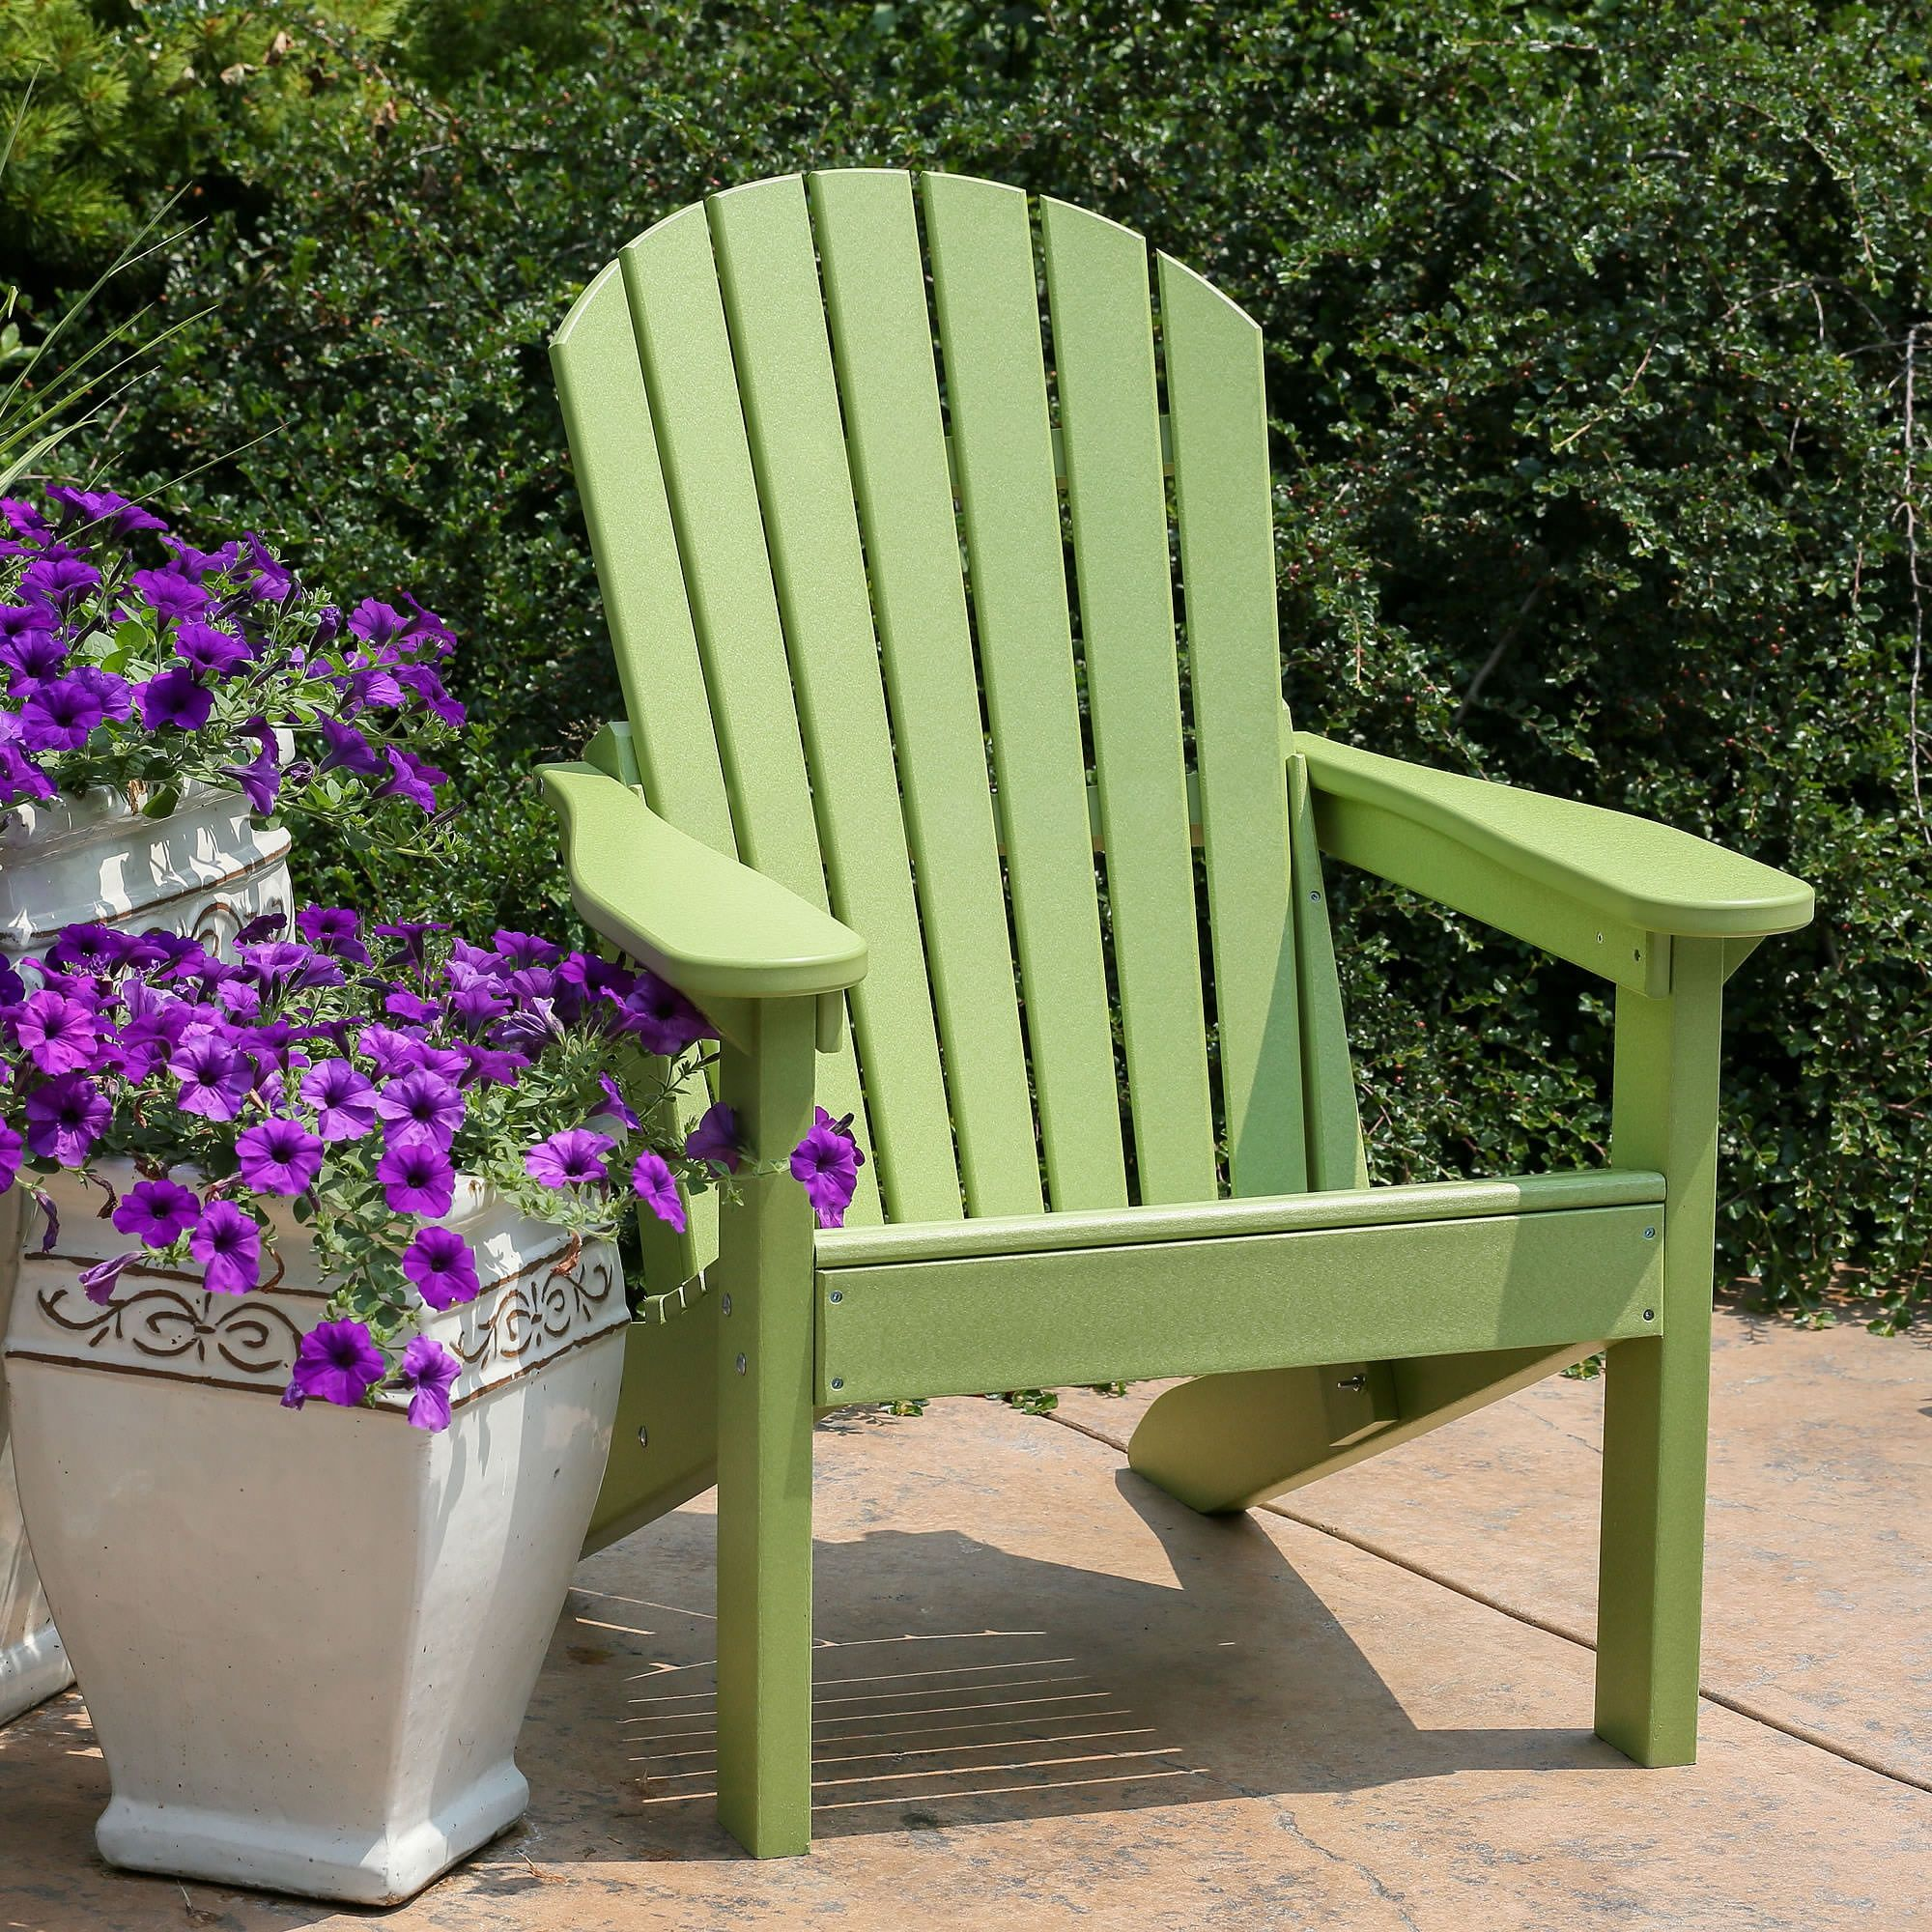 Berlin Gardens Tropical Adirondack Chair